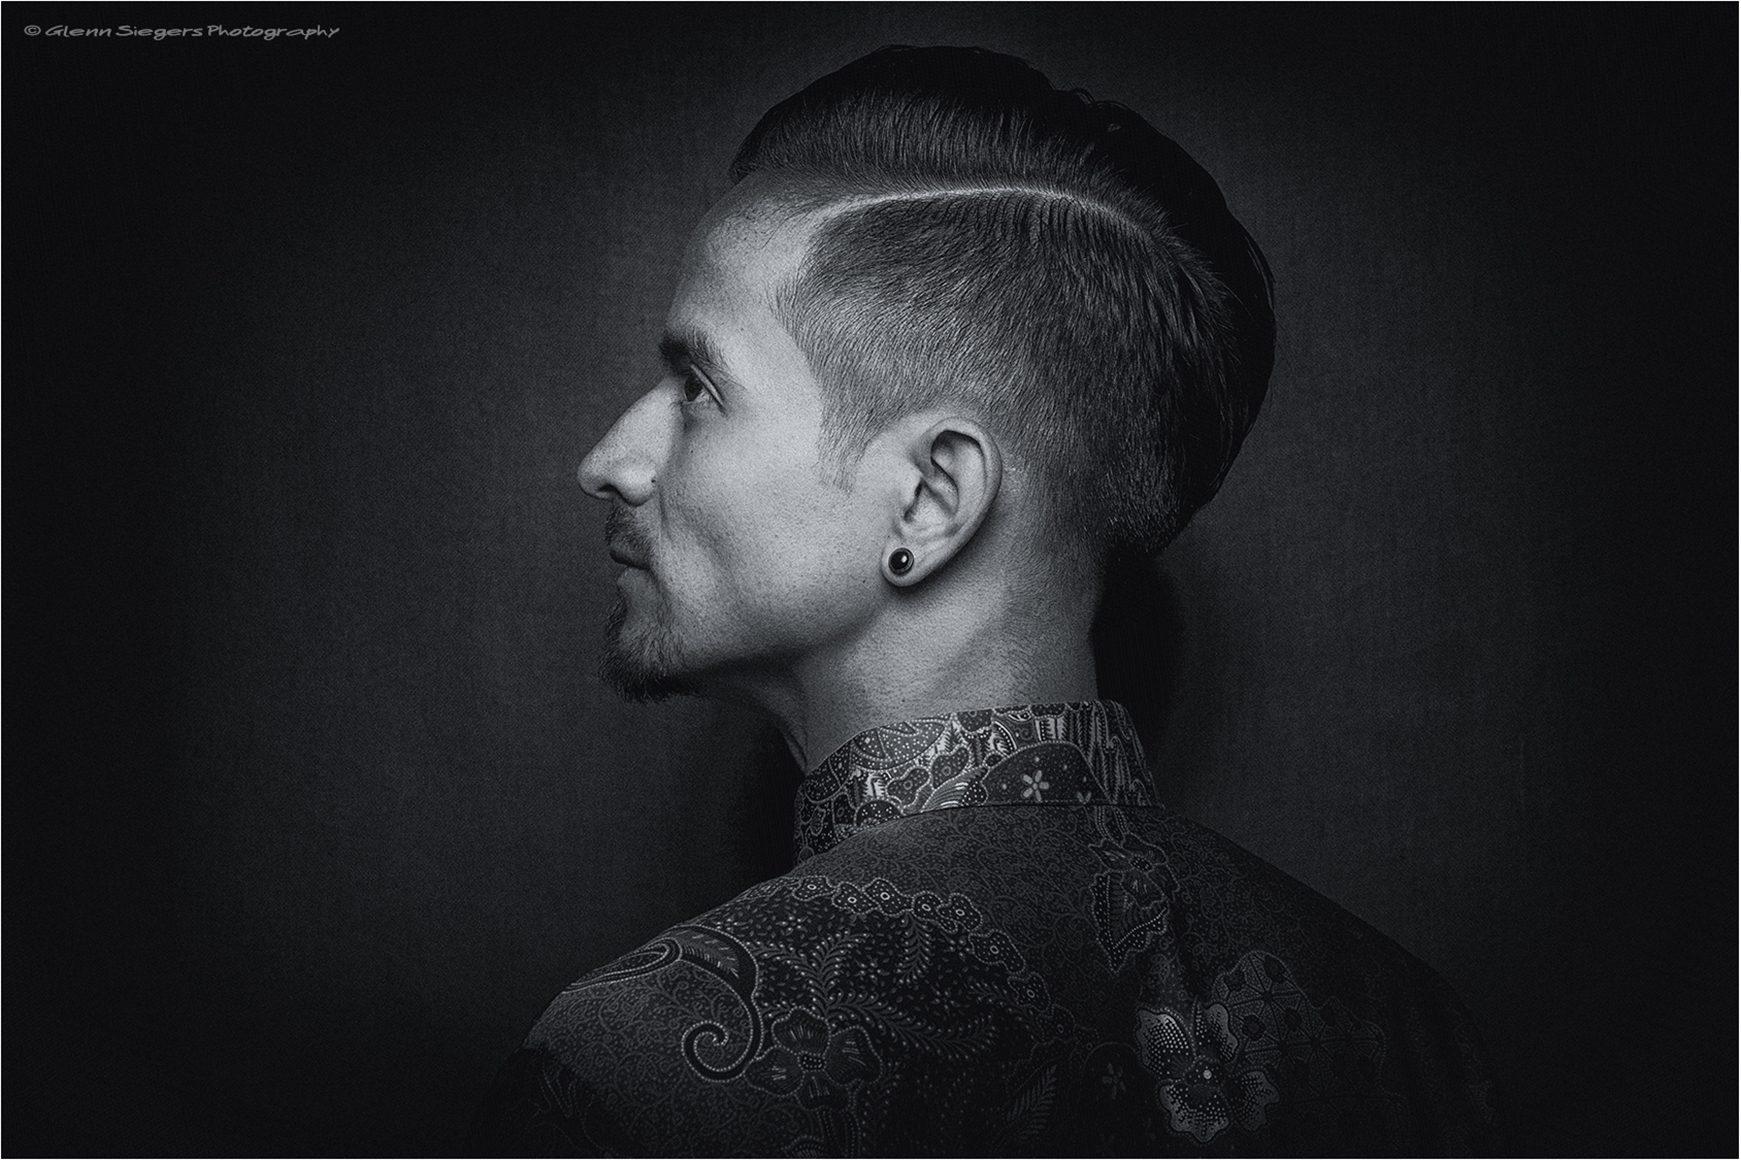 Glenn Siegers Photography